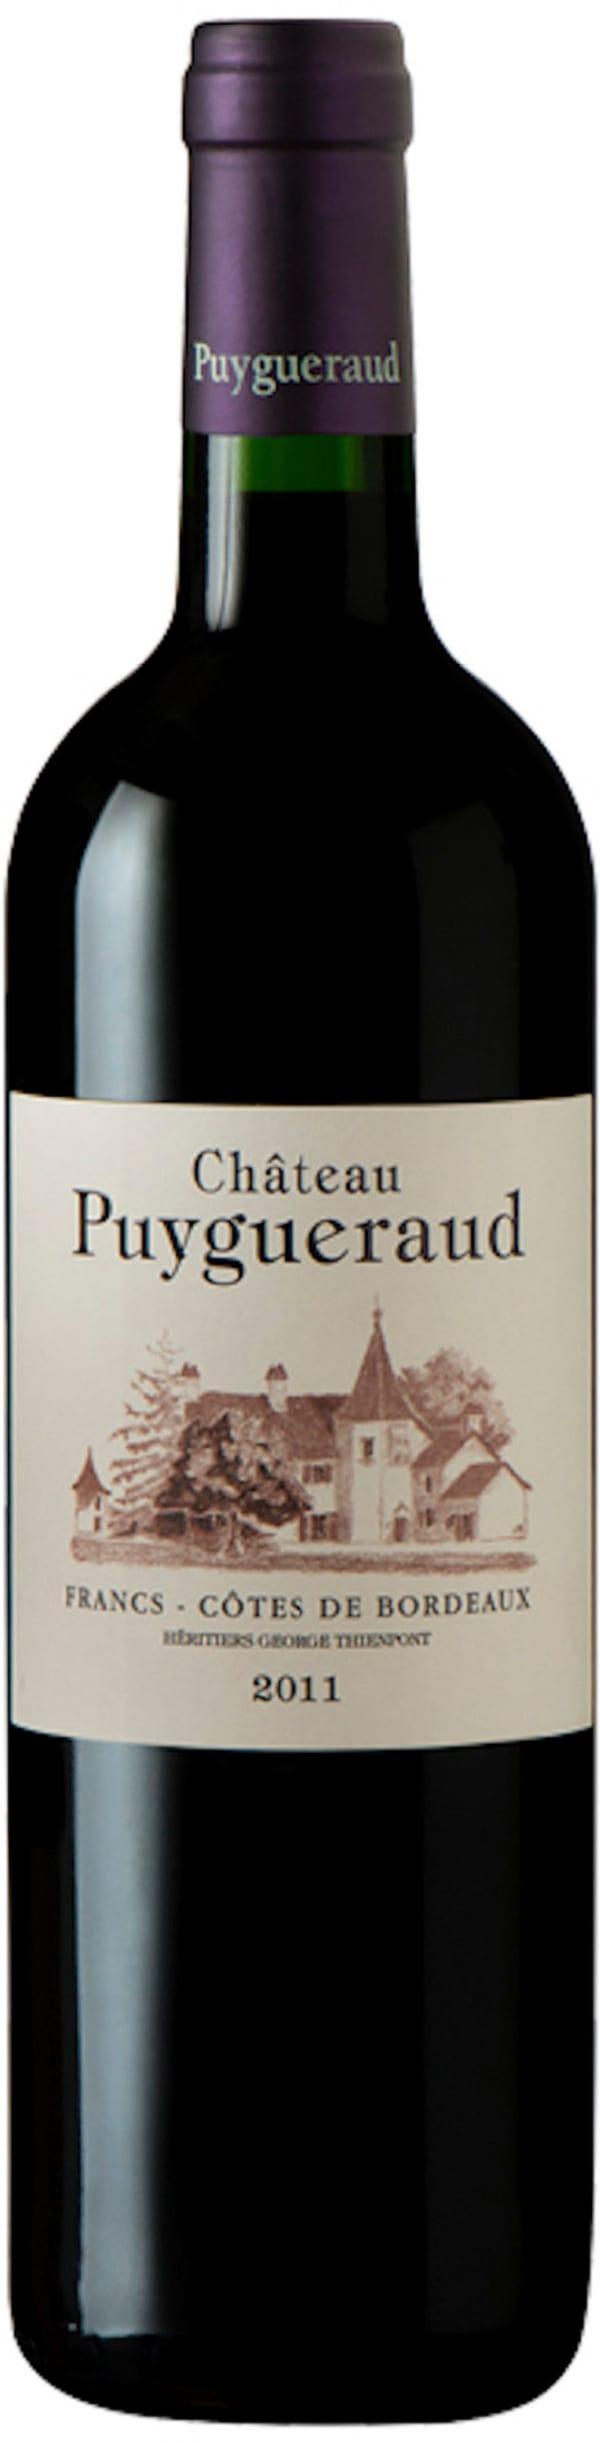 Château Puygueraud Rouge 2011